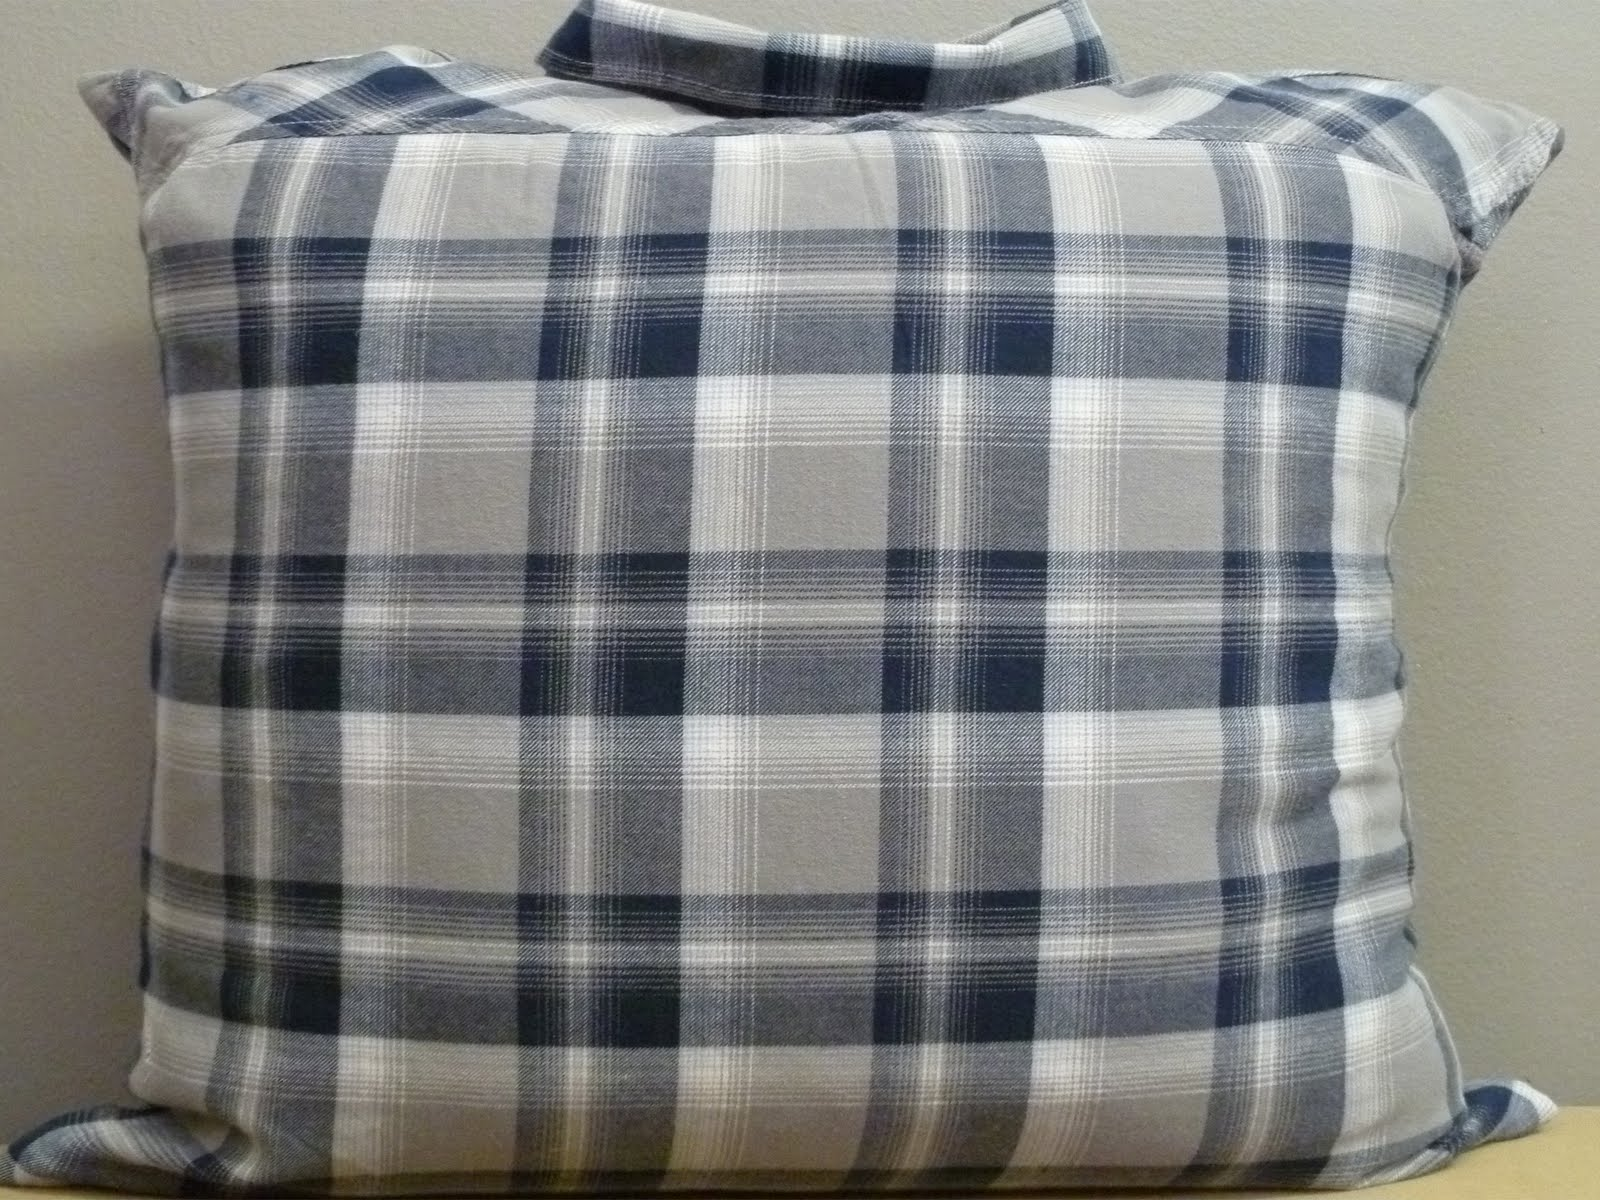 nakedwindow: 16x16 mens blue and gray flannel plaid shirt ...